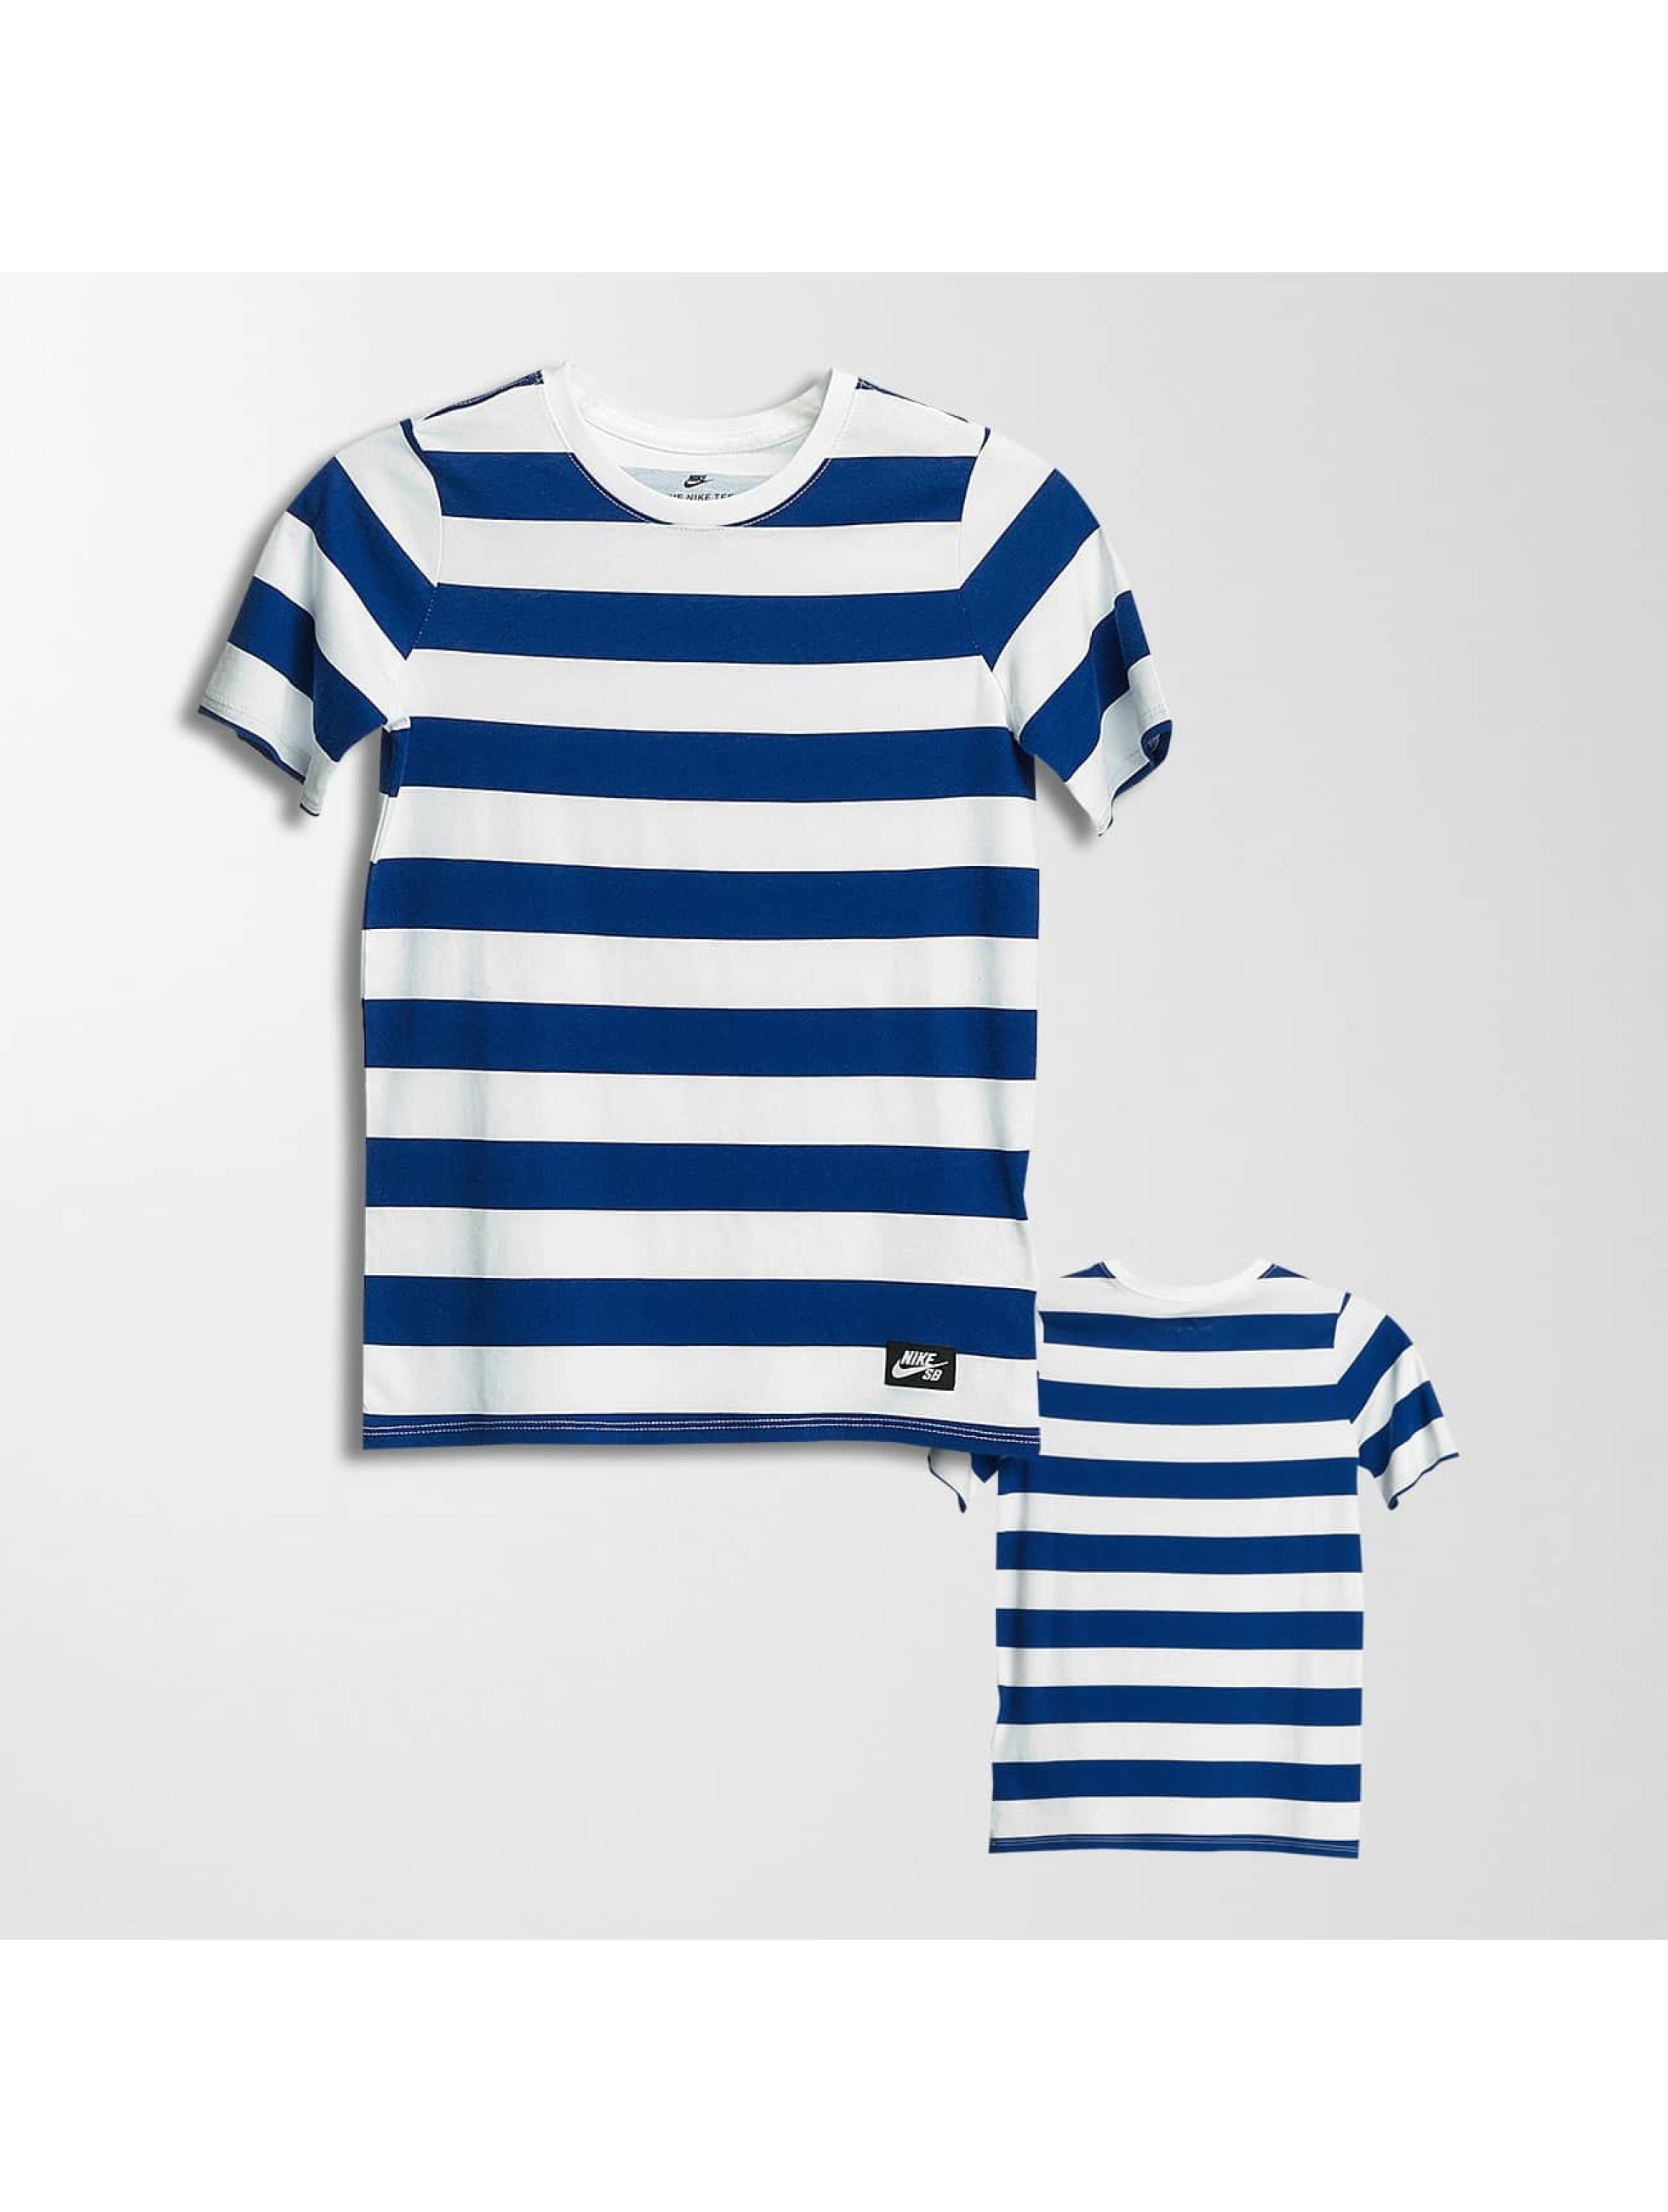 Nike SB Camiseta Boys blanco